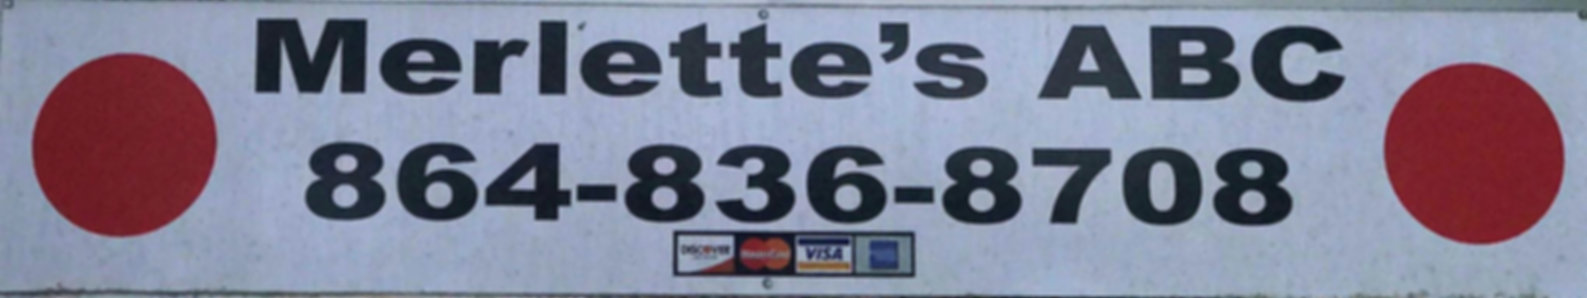 MERELETTES PLACE ABC_01R.jpg